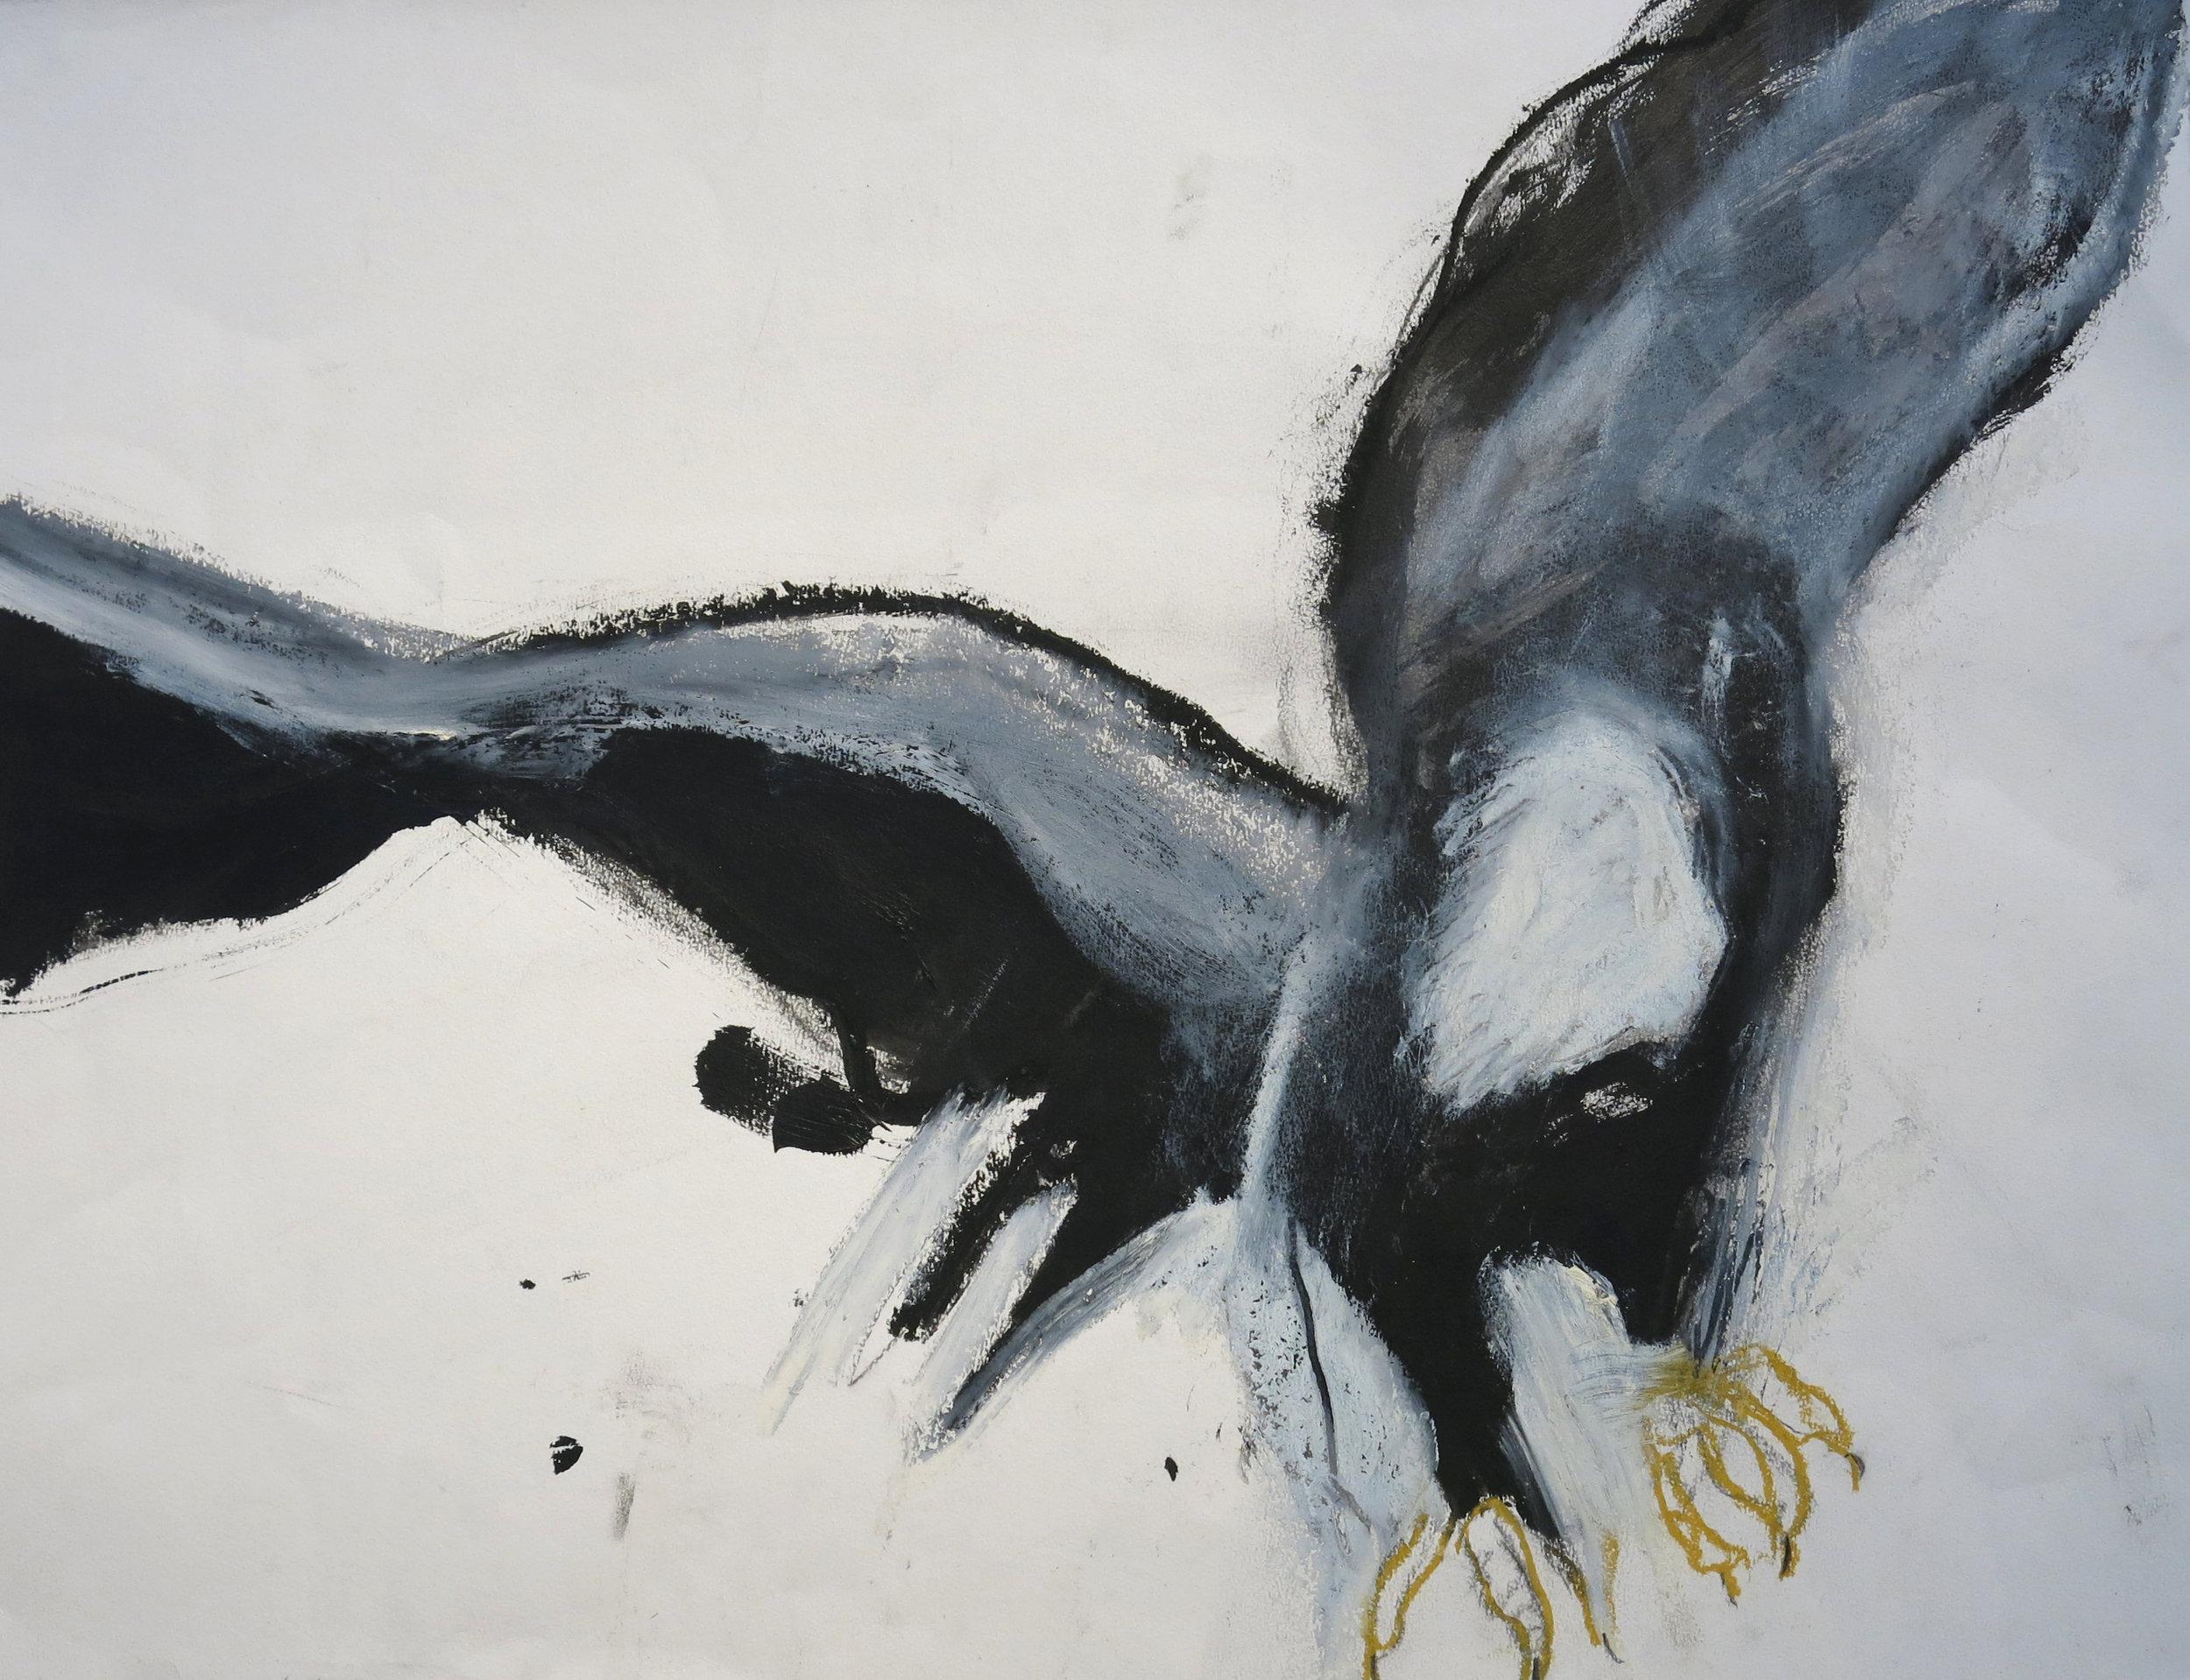 Franna Lusson, Untitled (FL 183), 20 x 26.5 inches